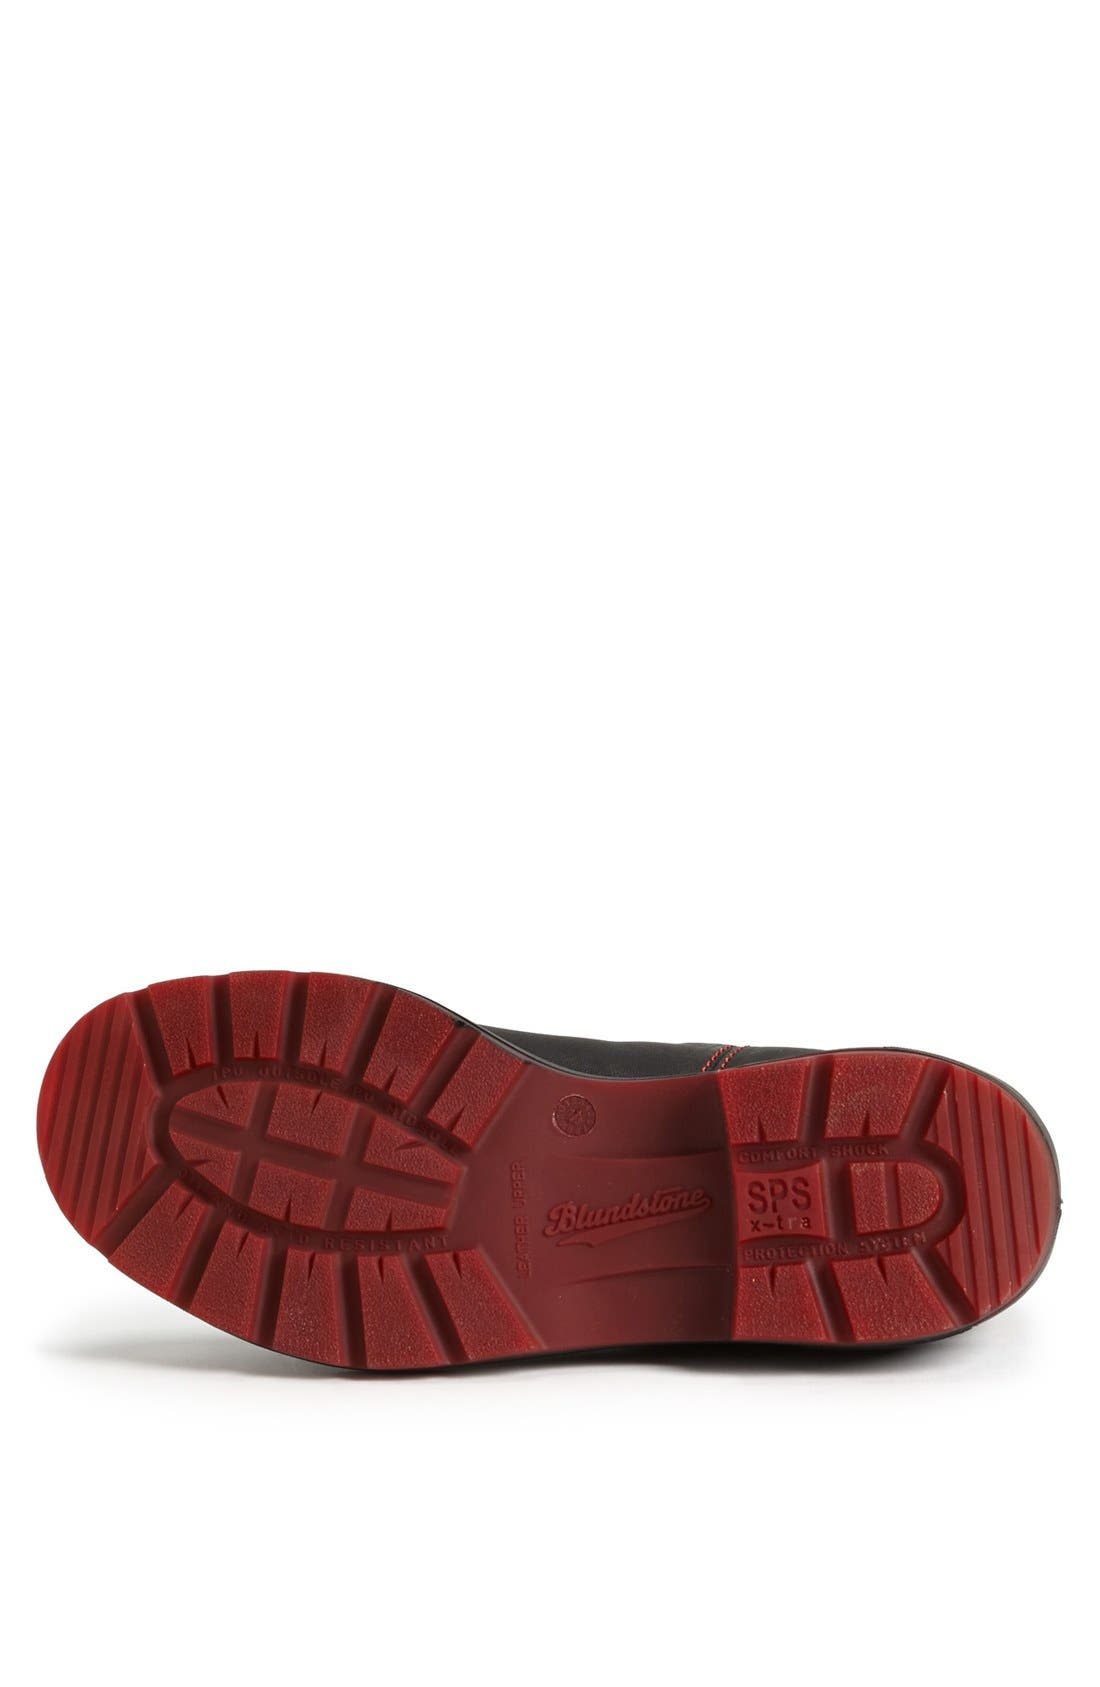 Chelsea Boot,                             Alternate thumbnail 4, color,                             BLACK/ RED GORE